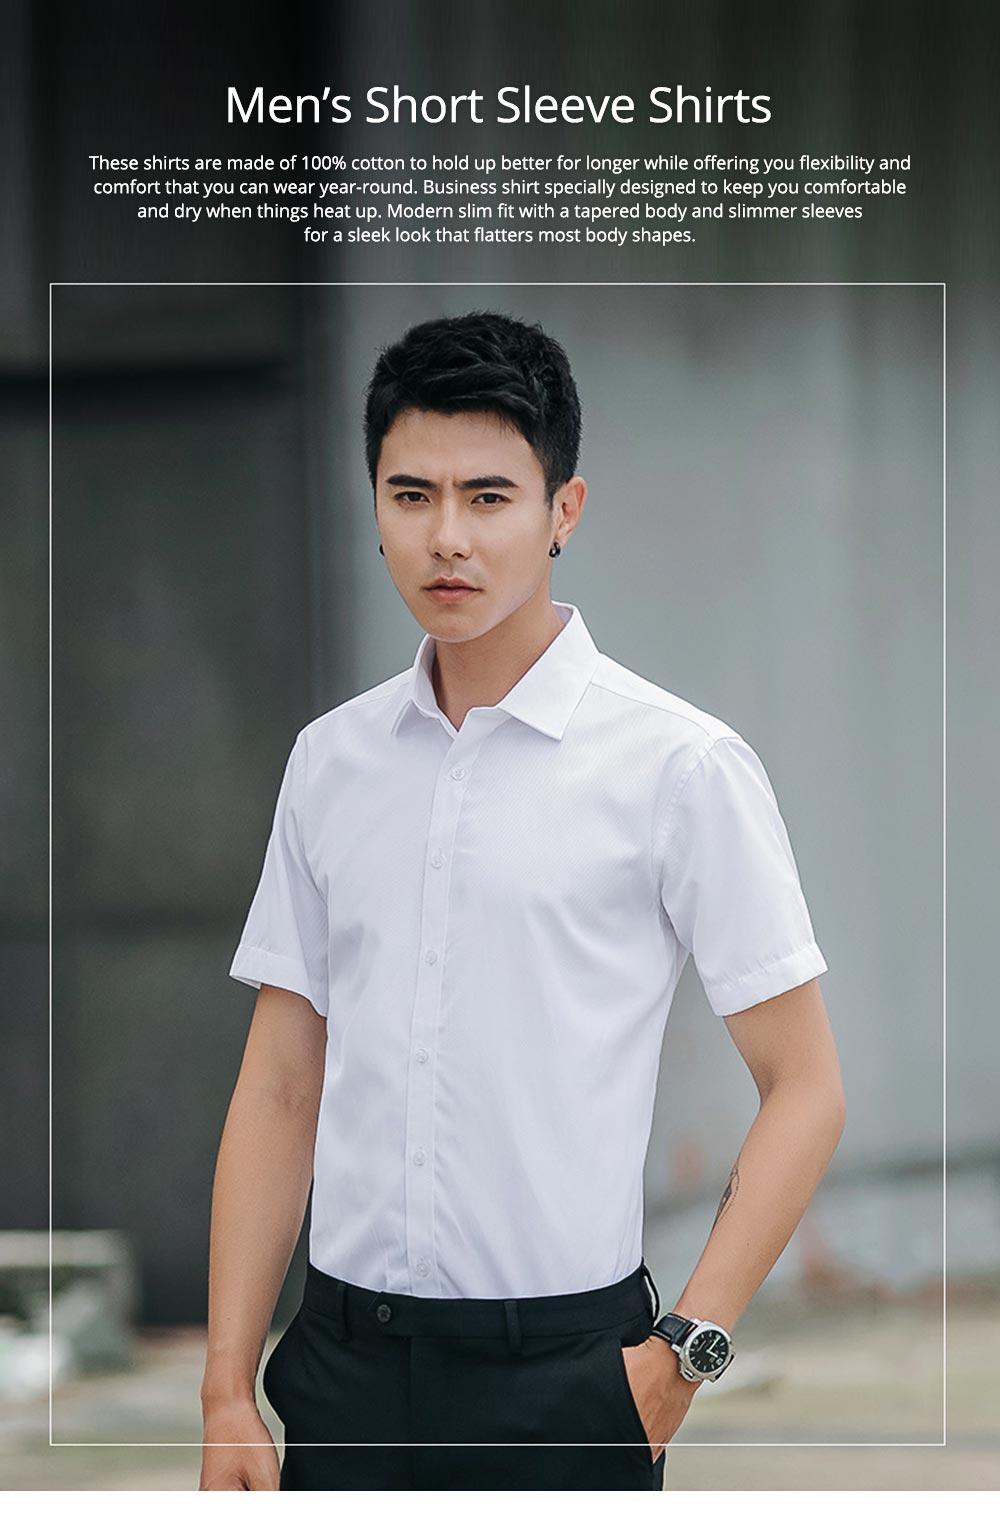 Men's Short Sleeve Shirts with Regular Fit Formal Business Cotton Solid Shirt Classic Slim Fit Flex Collar Dress Shirt 0